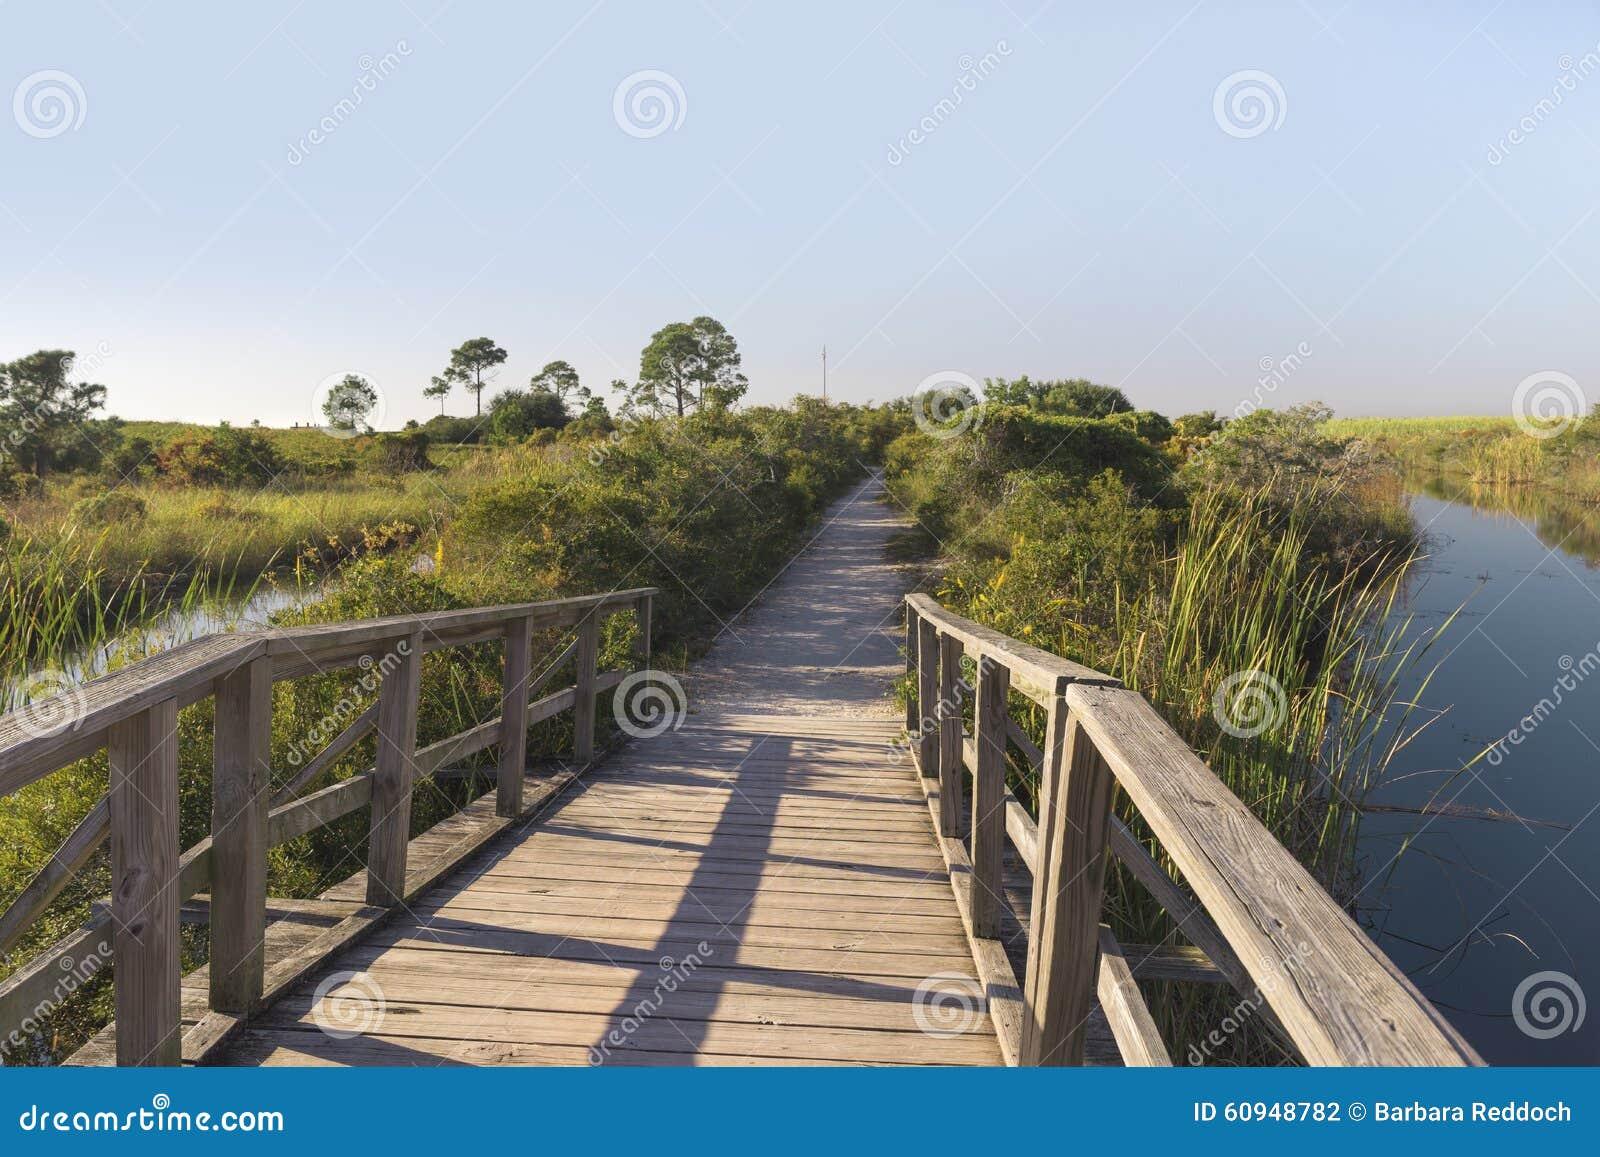 Wooden Footbridge Path at Fort Pickens